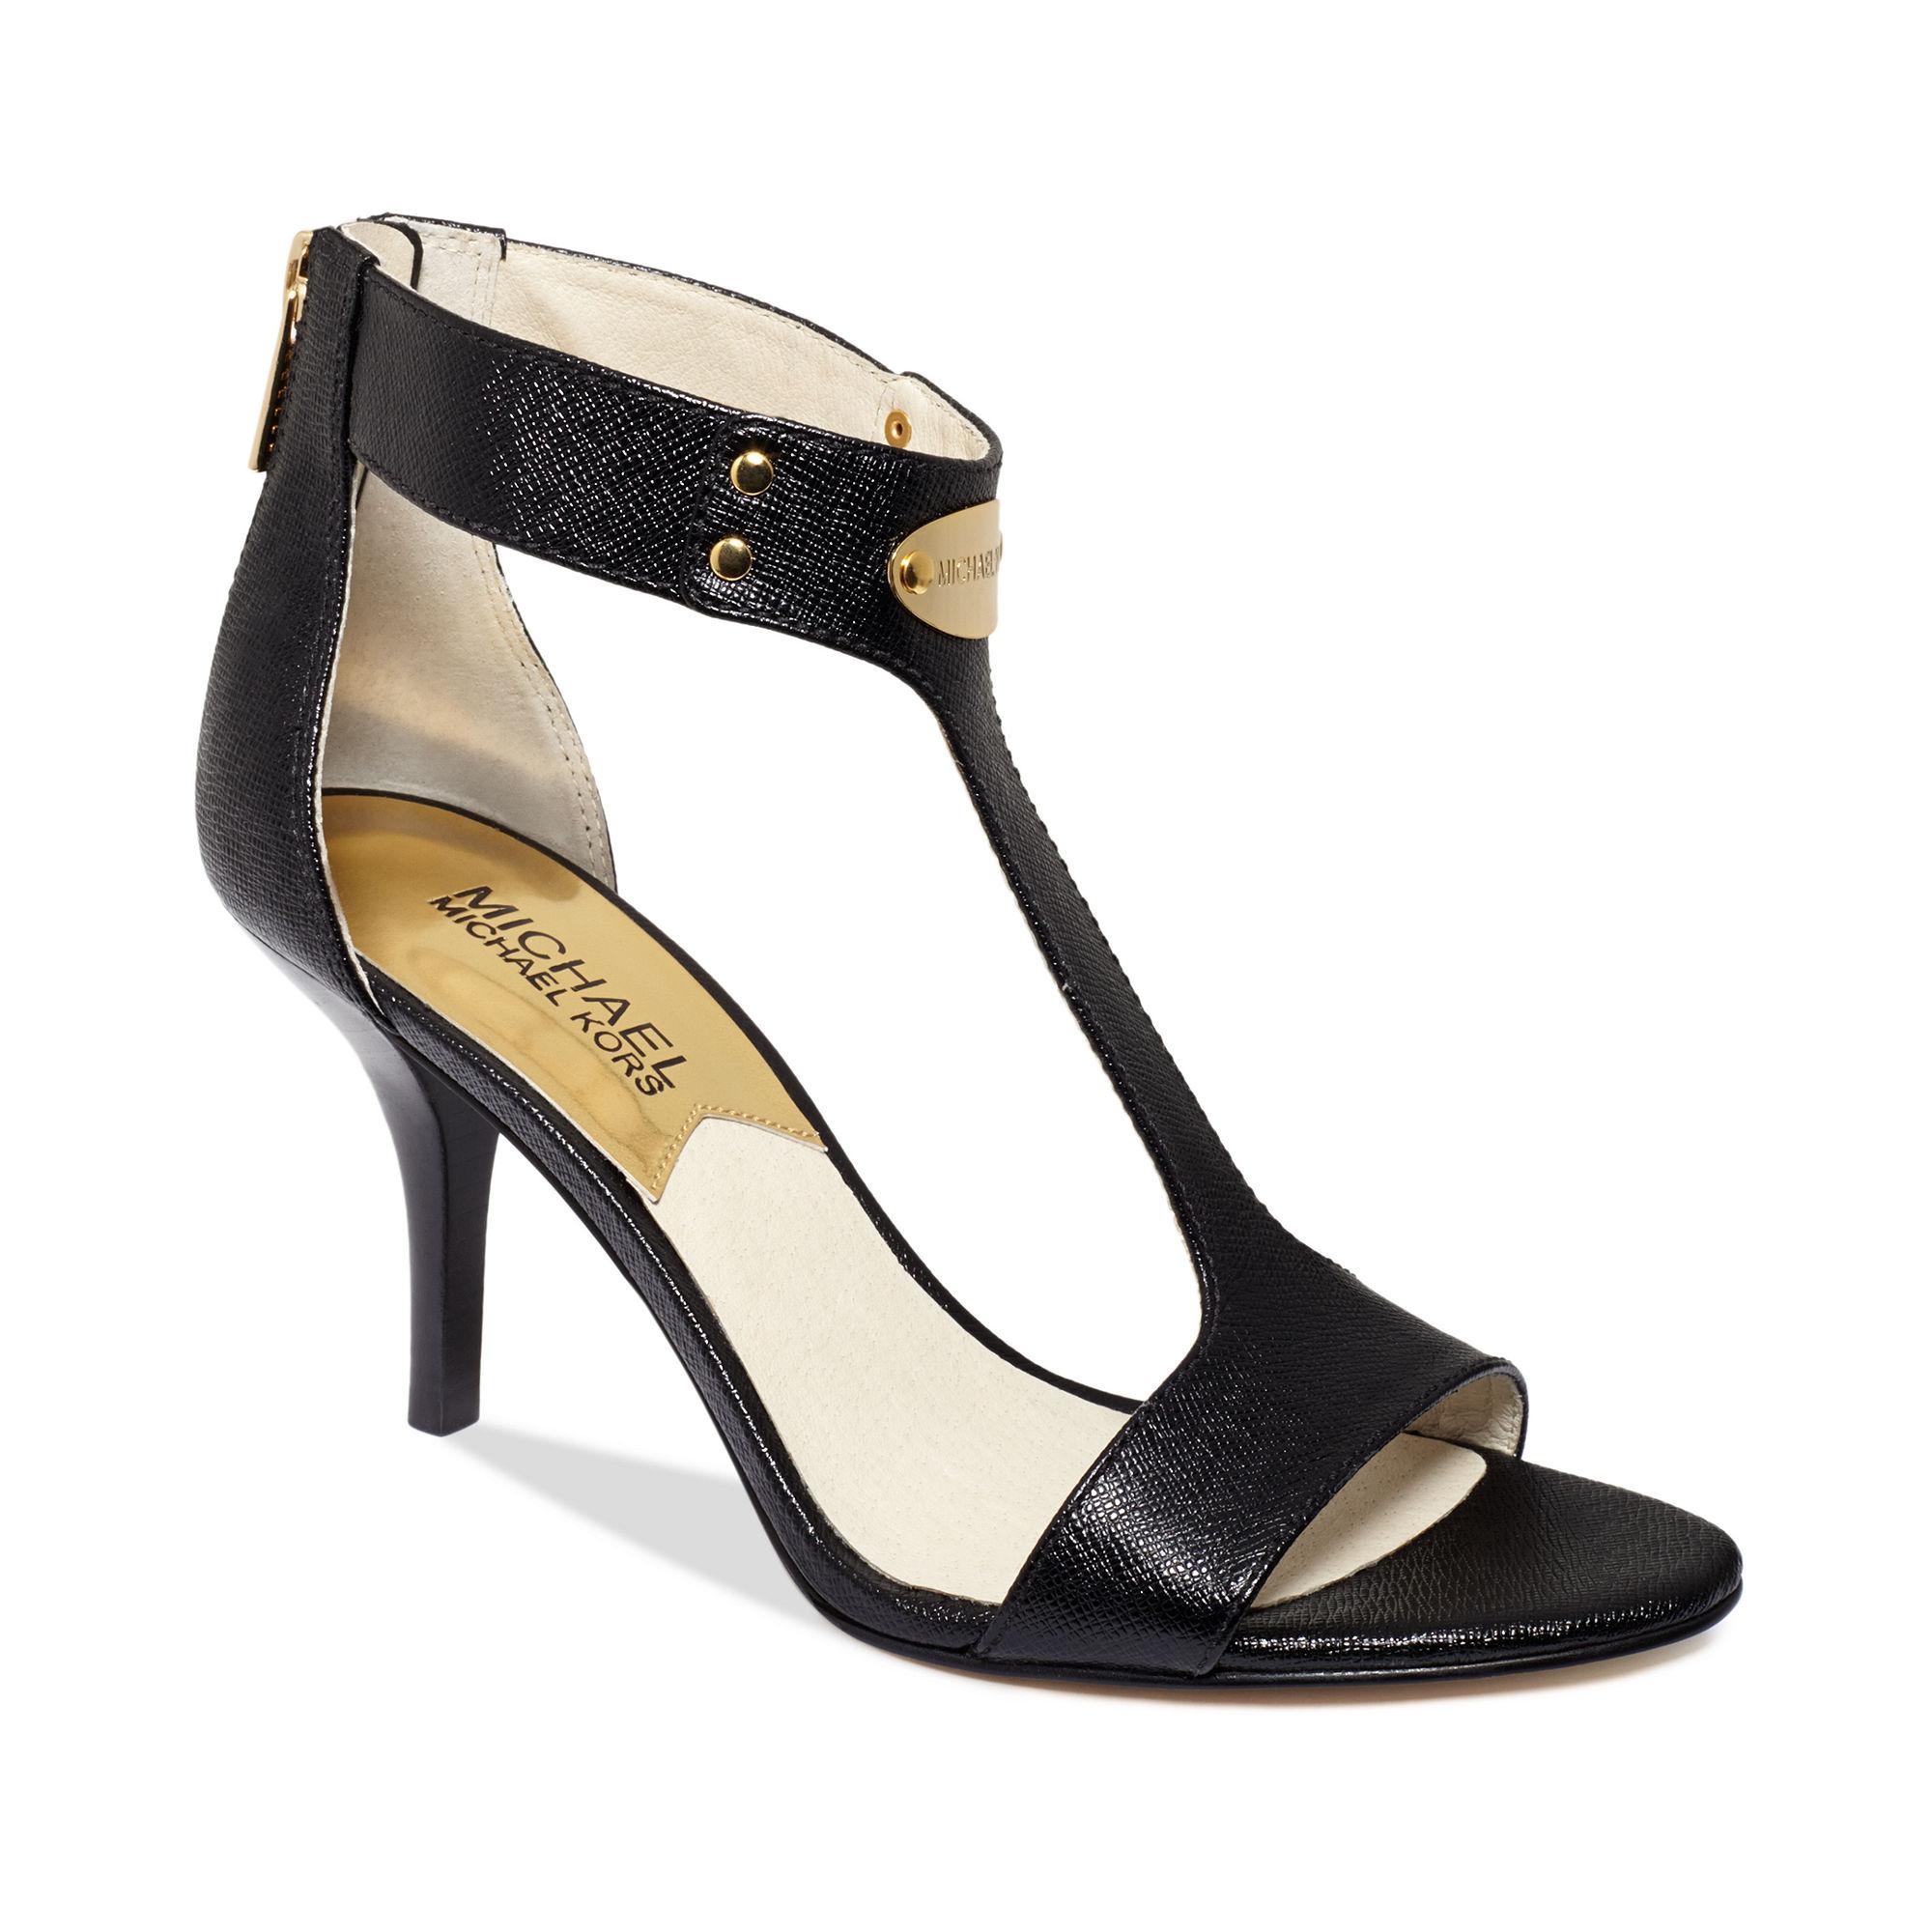 b10e1ecf1f50 Lyst - Michael Kors Mk Plate Mid Heel Sandals in Black